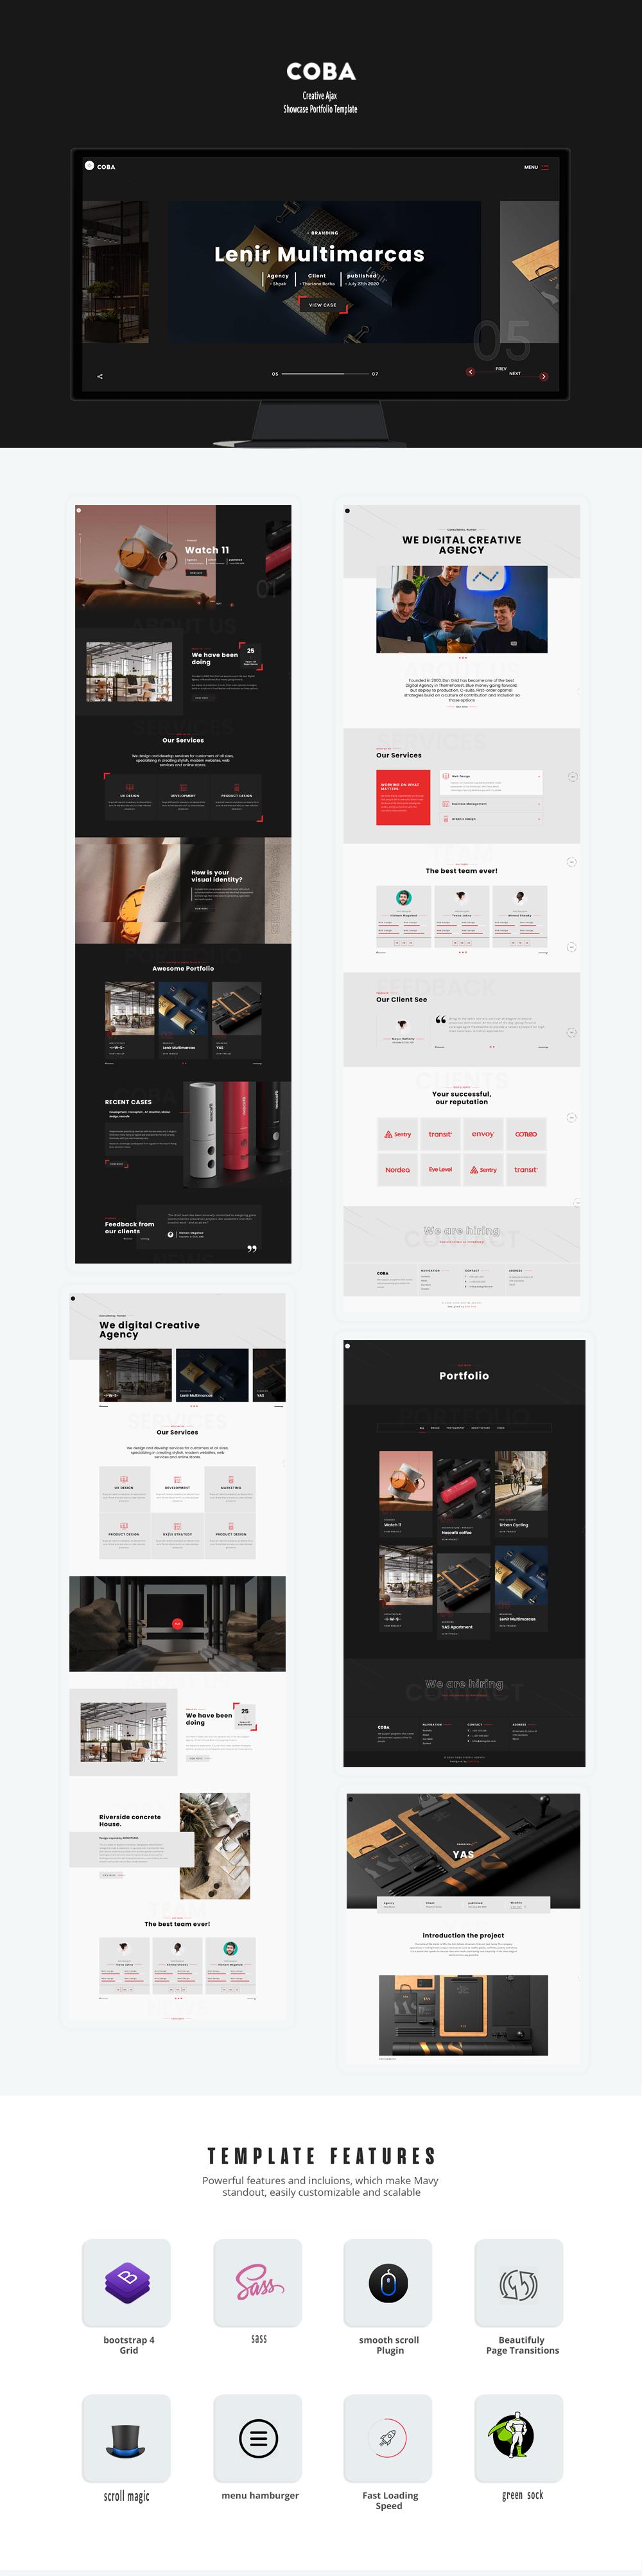 Coba - Creative Ajax Showcase Portfolio Template - 1